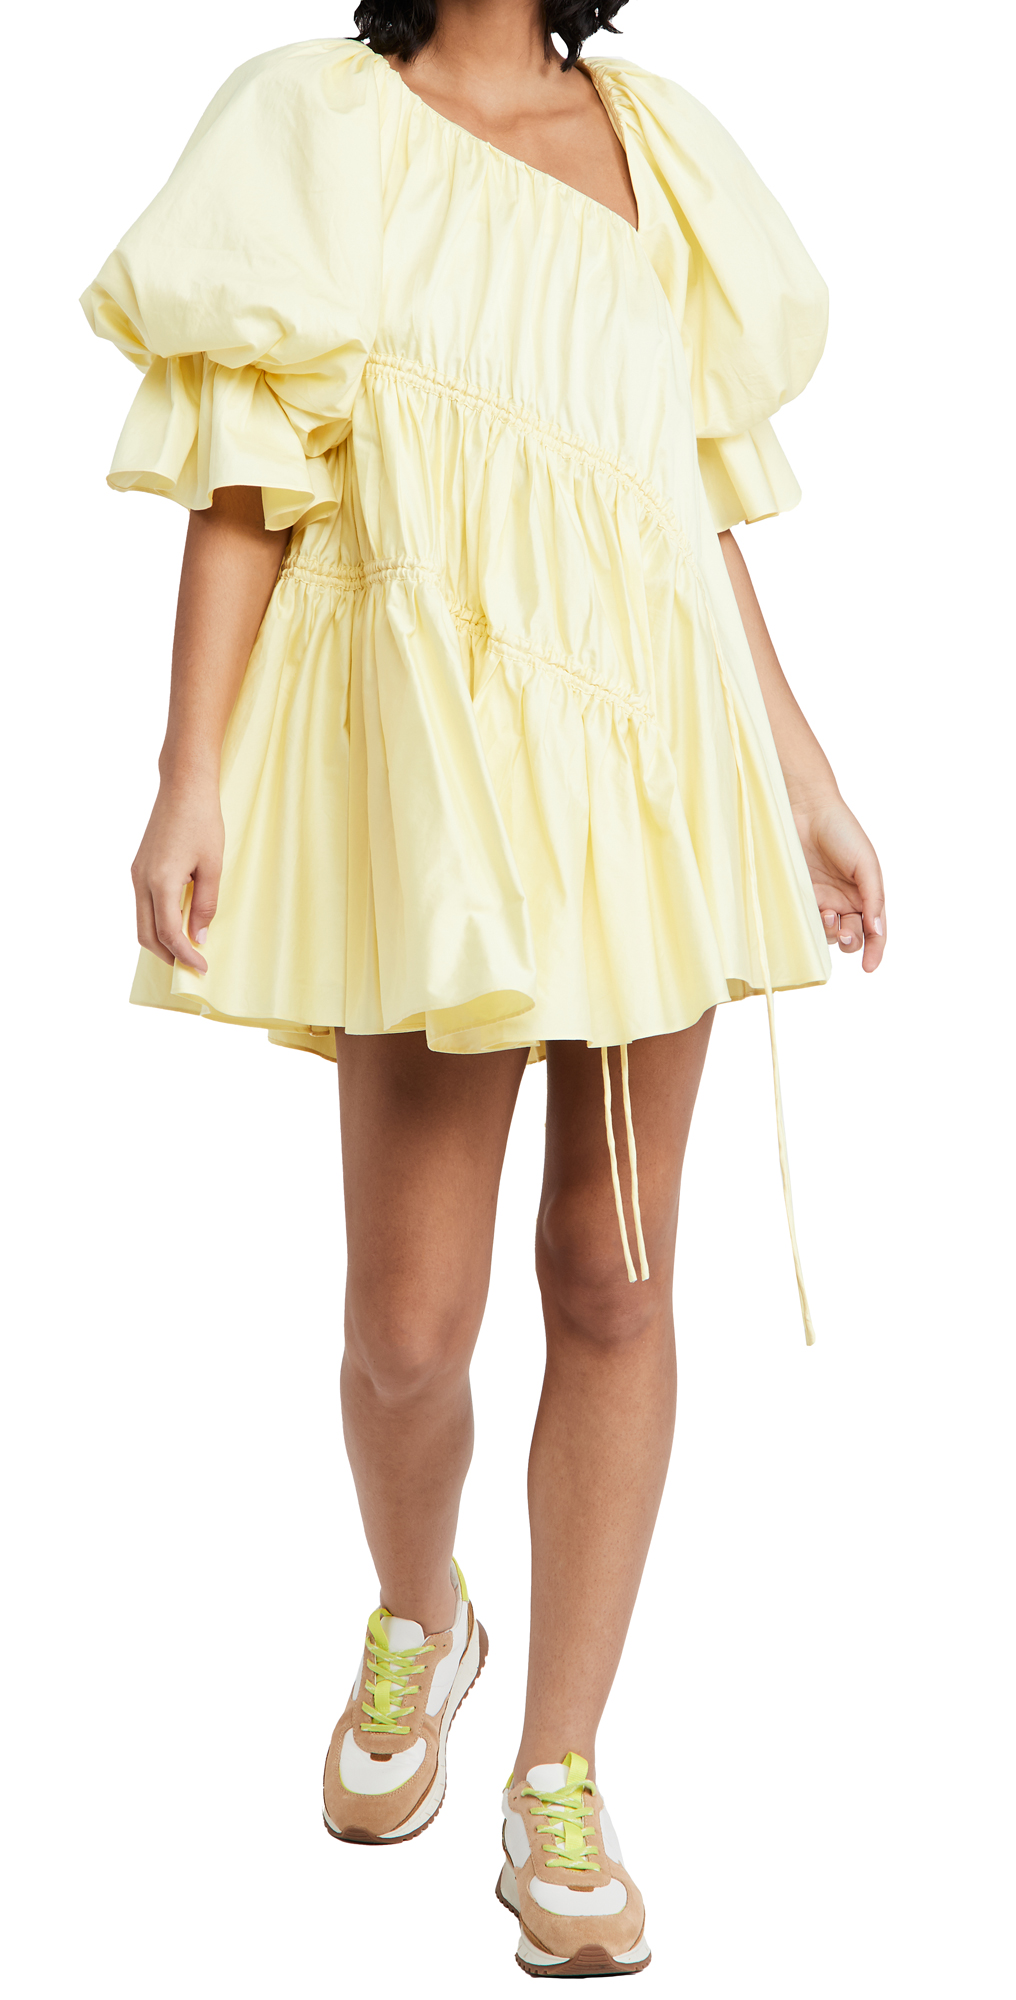 Aje Hushed Asymmetric Dress